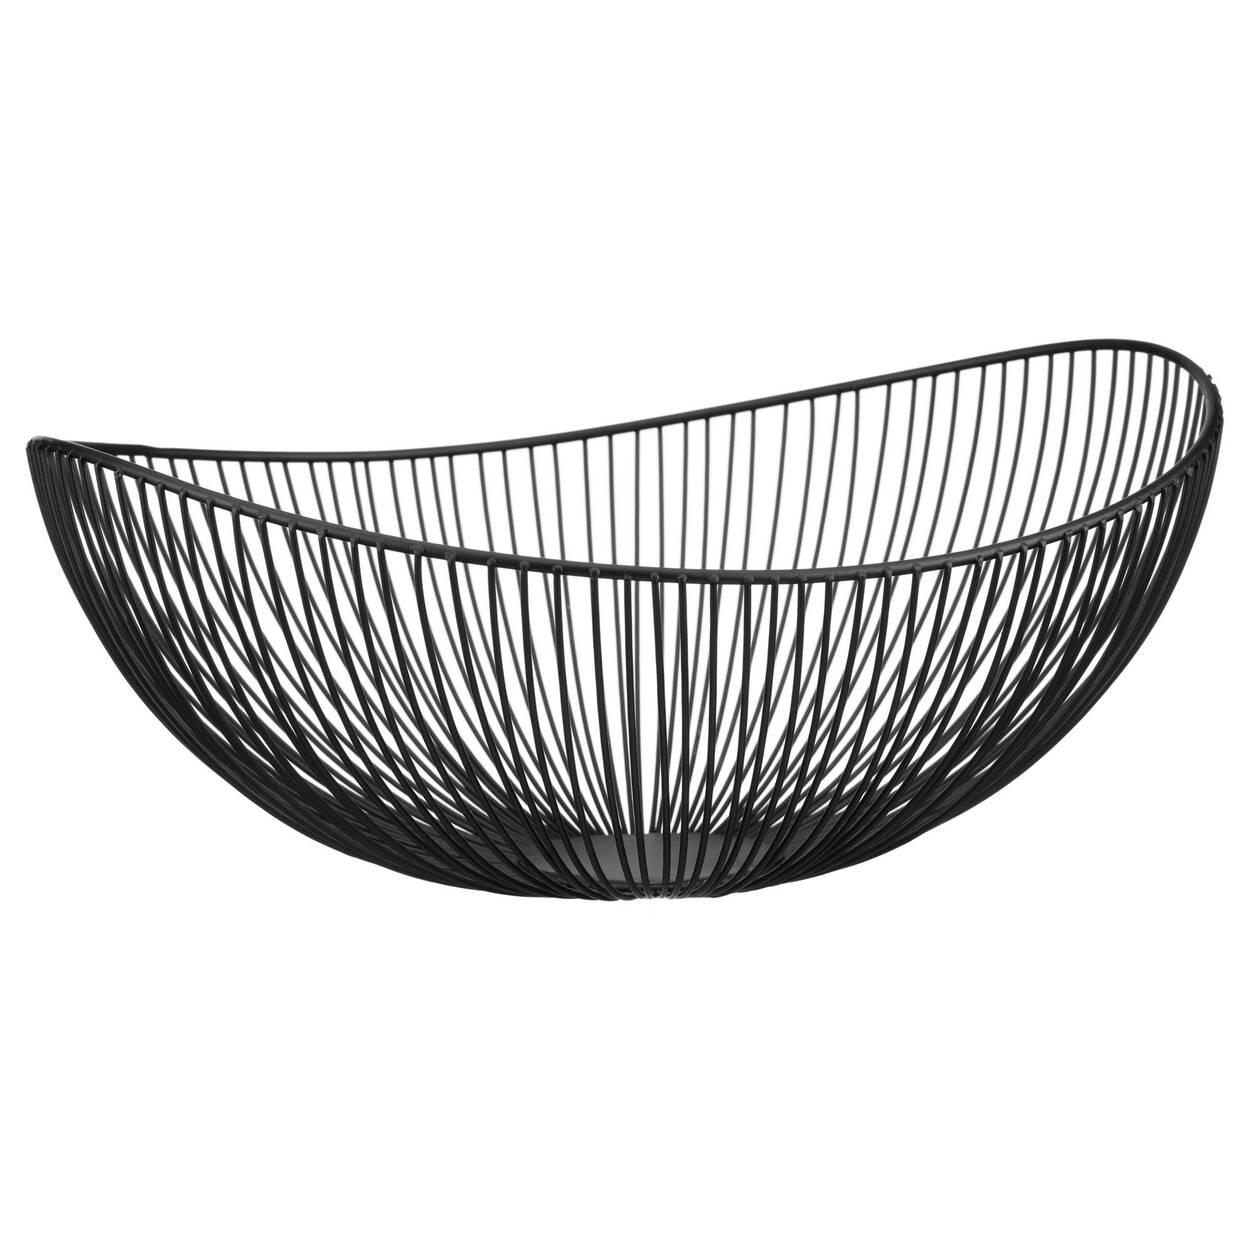 Decorative Metal Wire Bowl